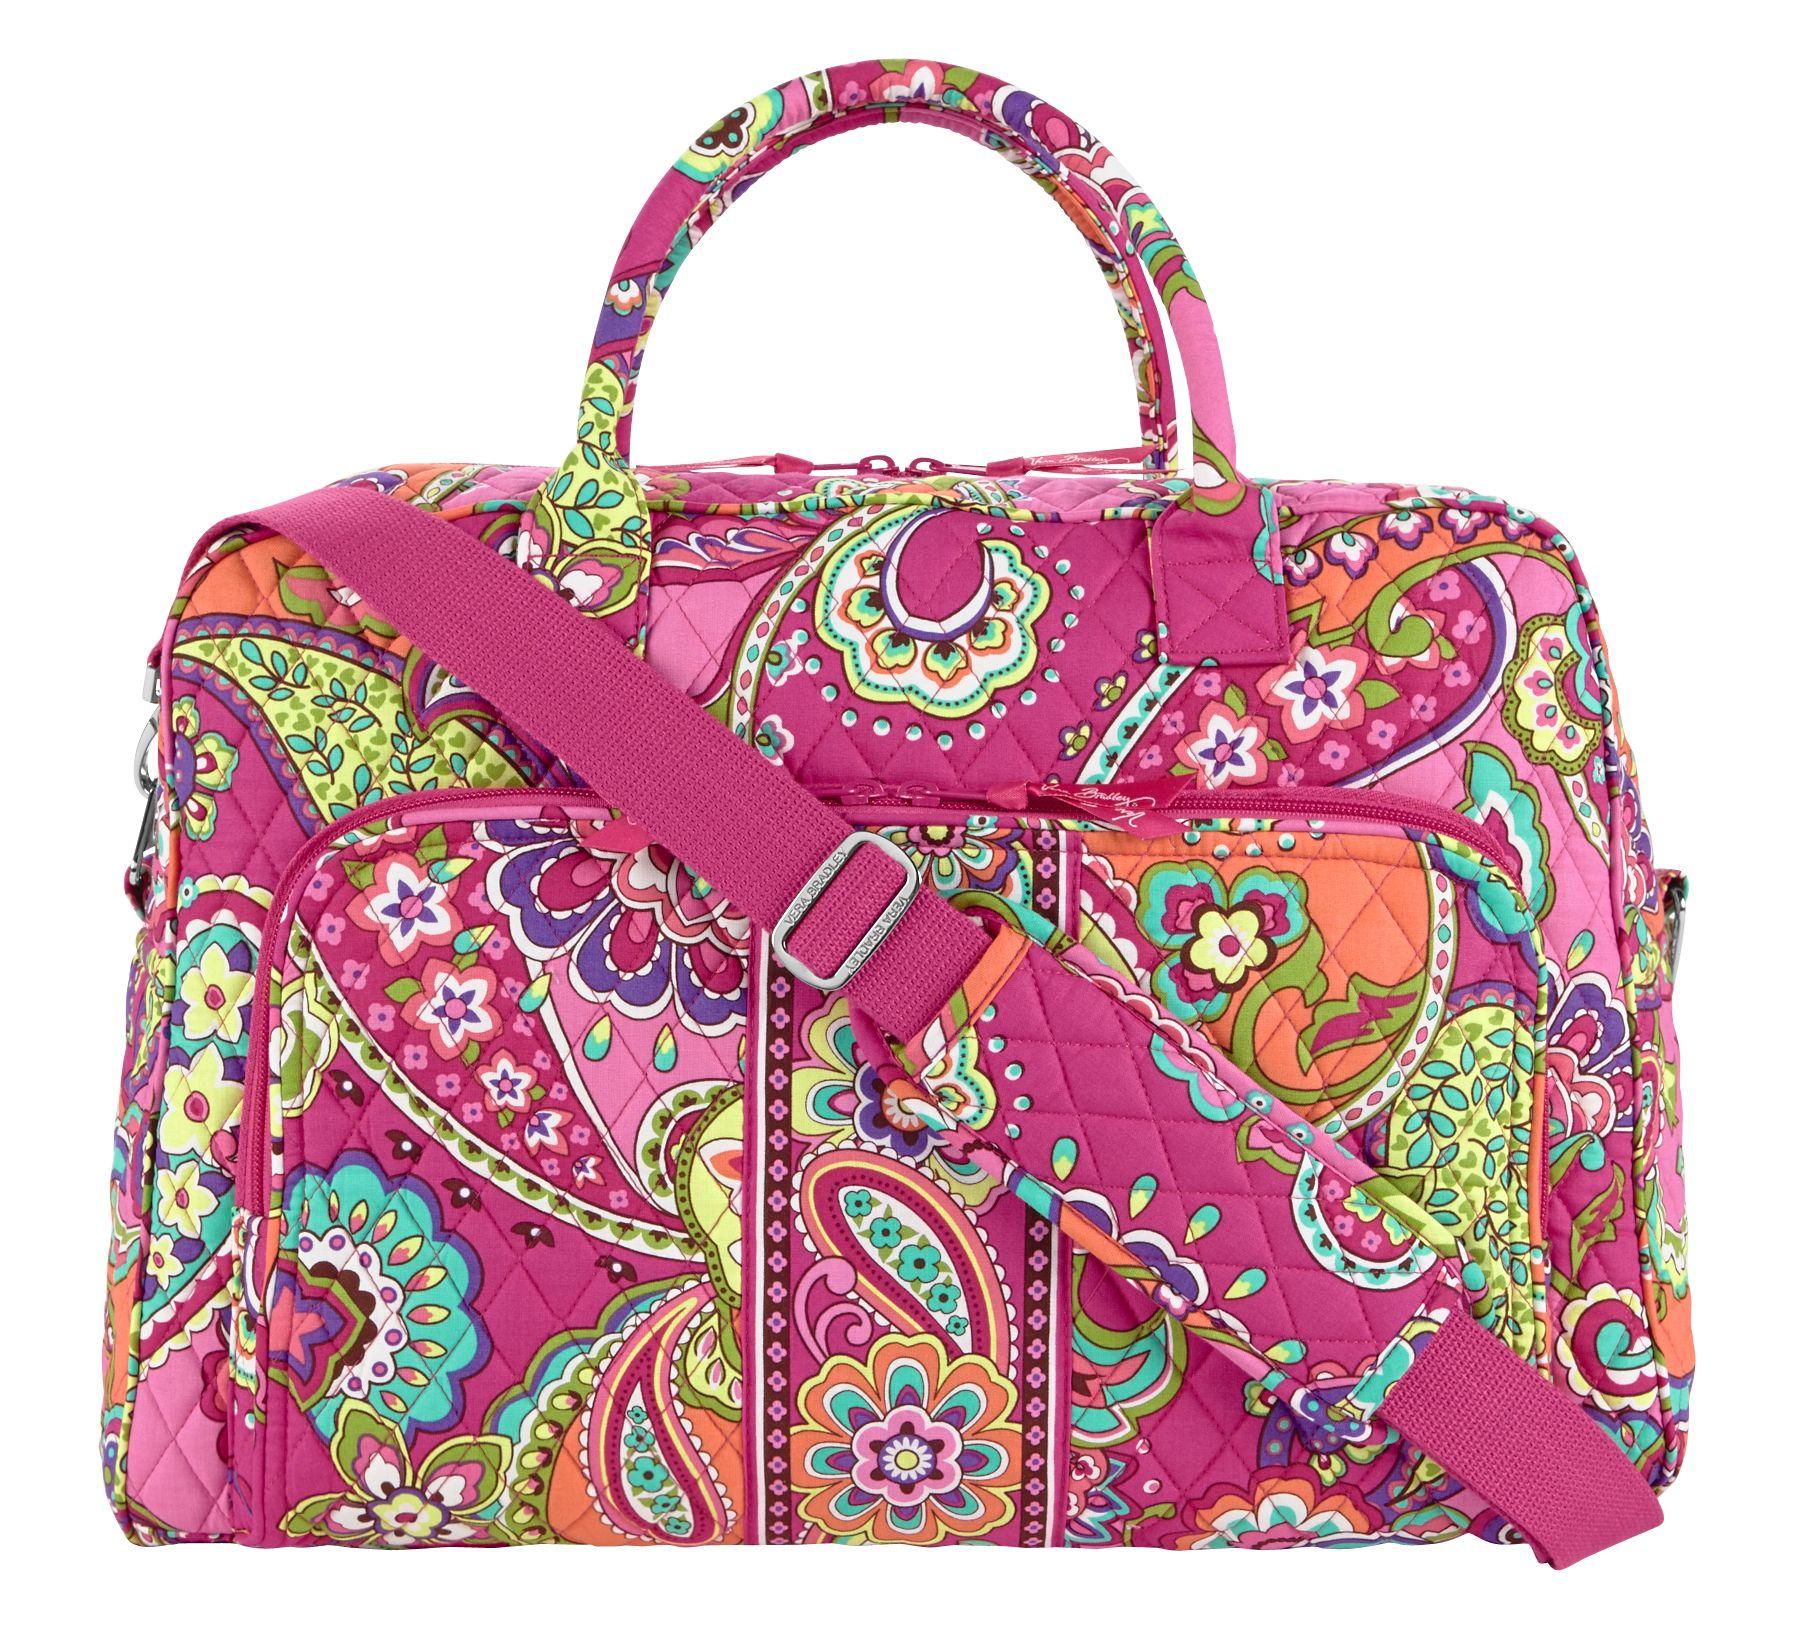 vera bradley weekender travel bag only 49 73 50 black friday